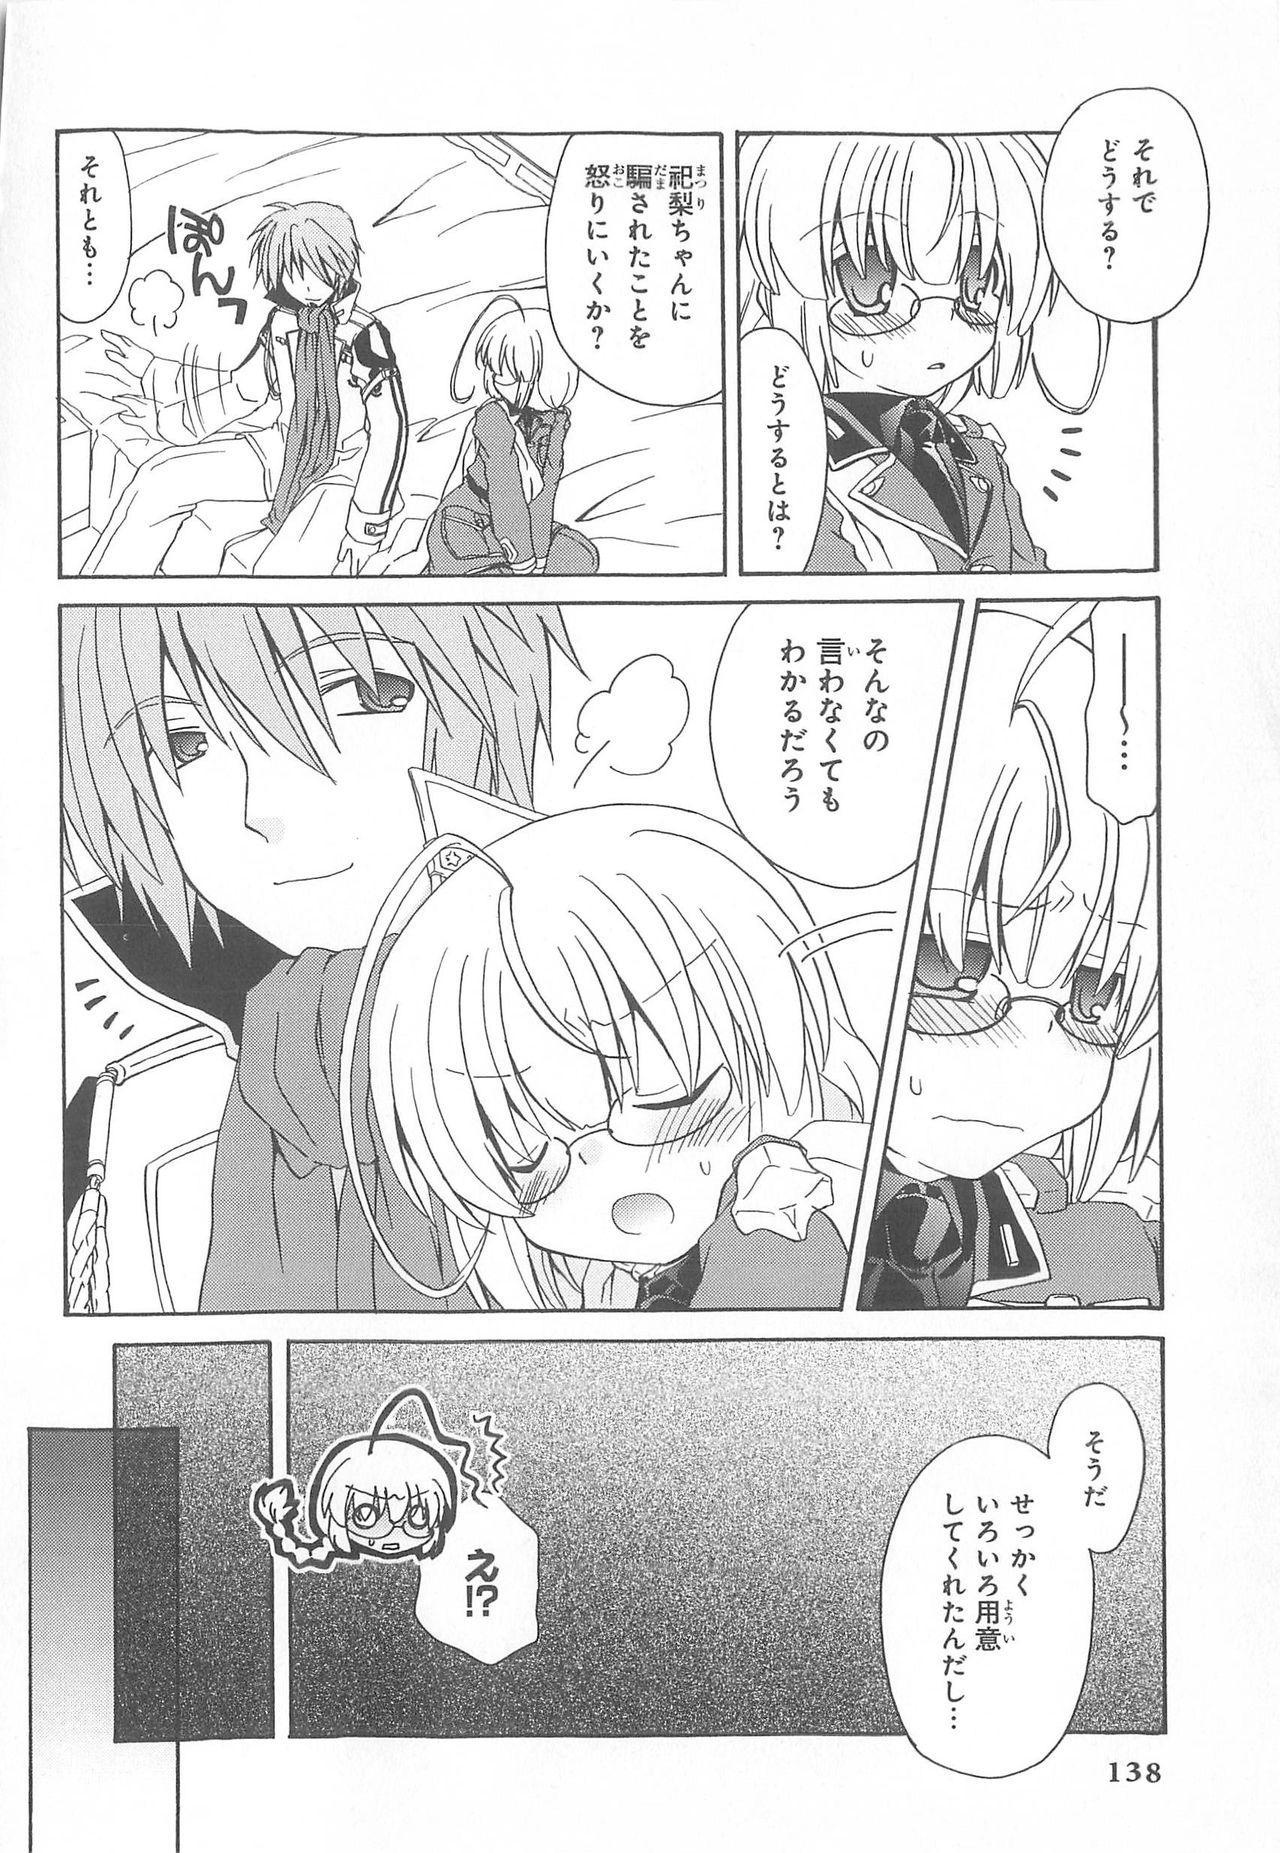 Daiteikoku comic Anthology vol.2 138